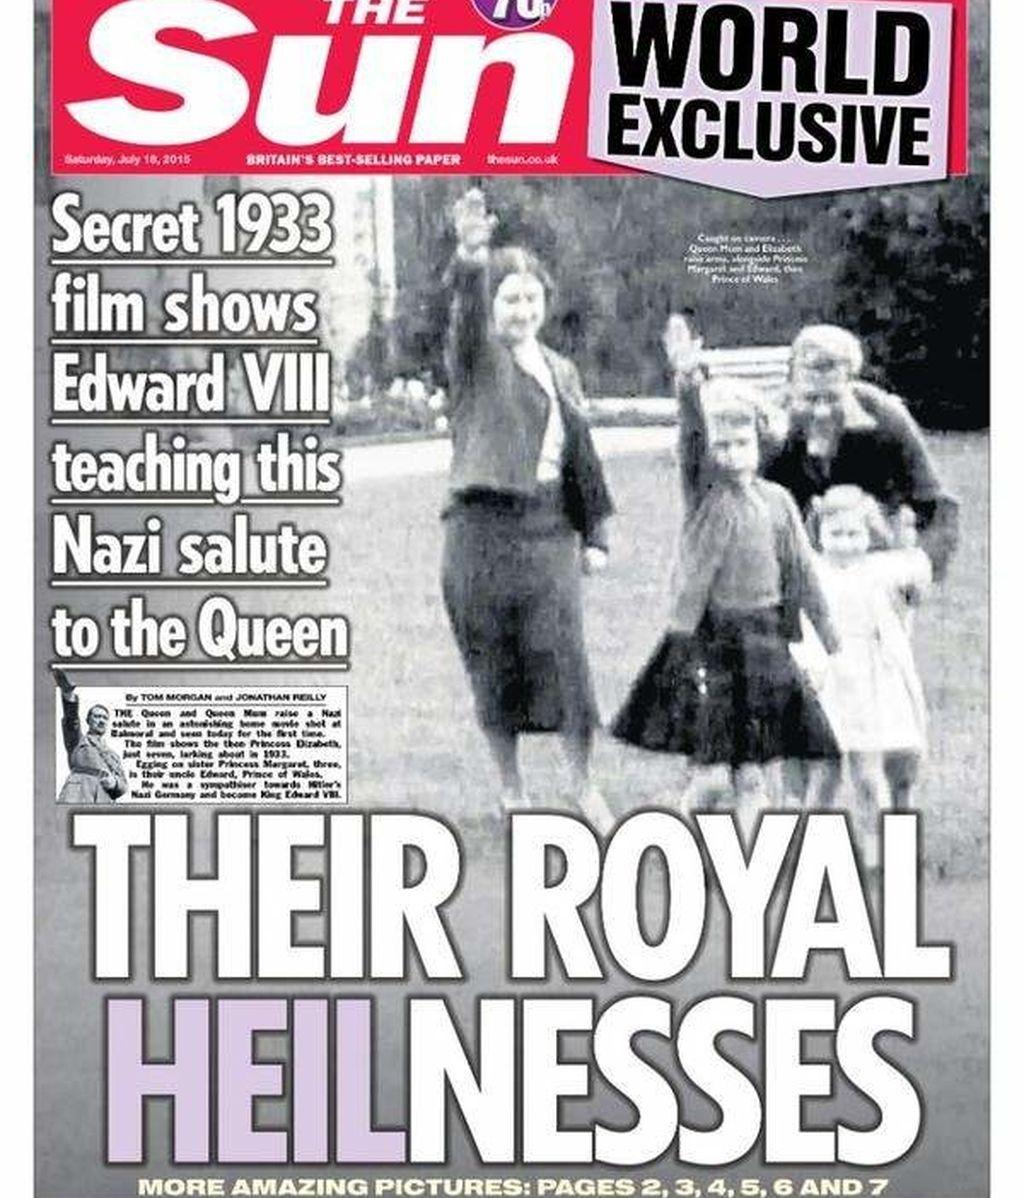 Portada de 'THE SUN' donde la reina Isabel II hace el saludo nazi